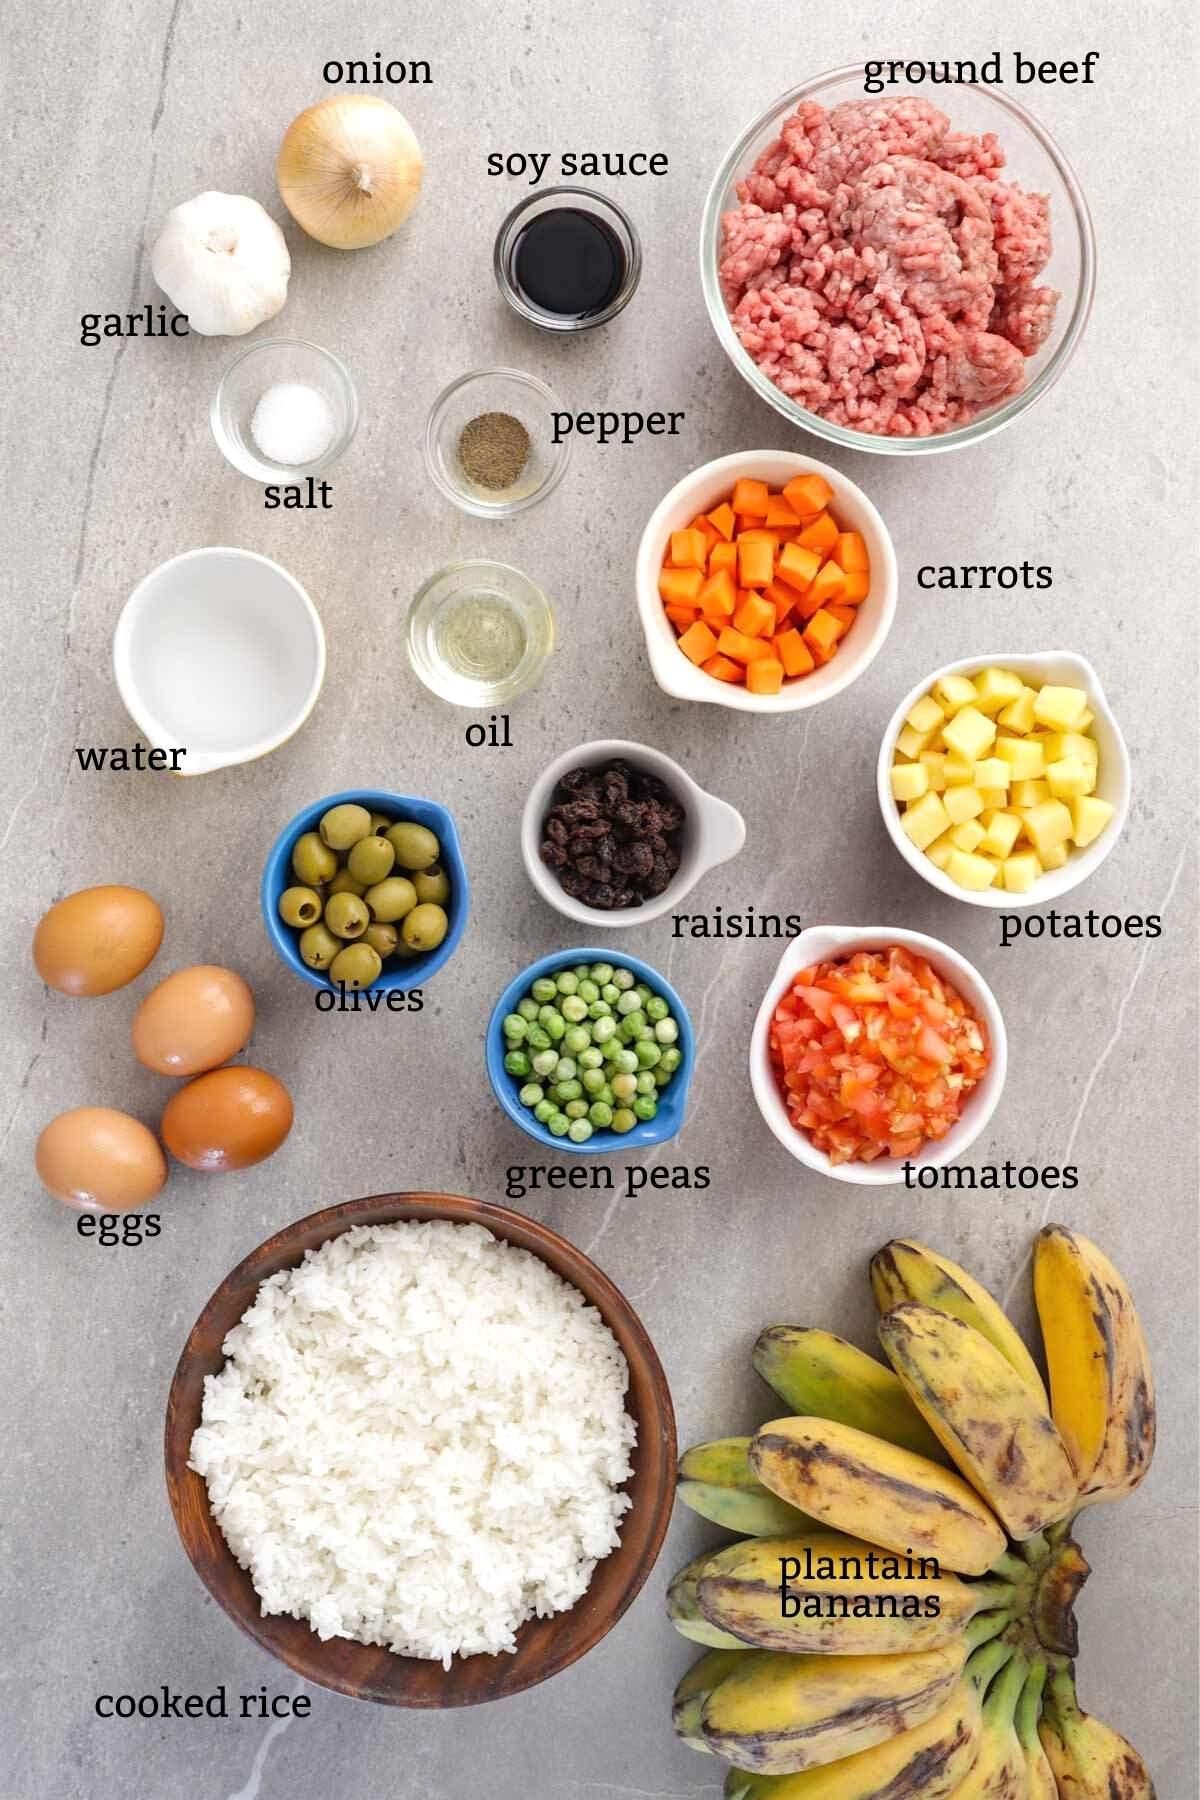 Ingredients for making Arroz ala Cubana dish.